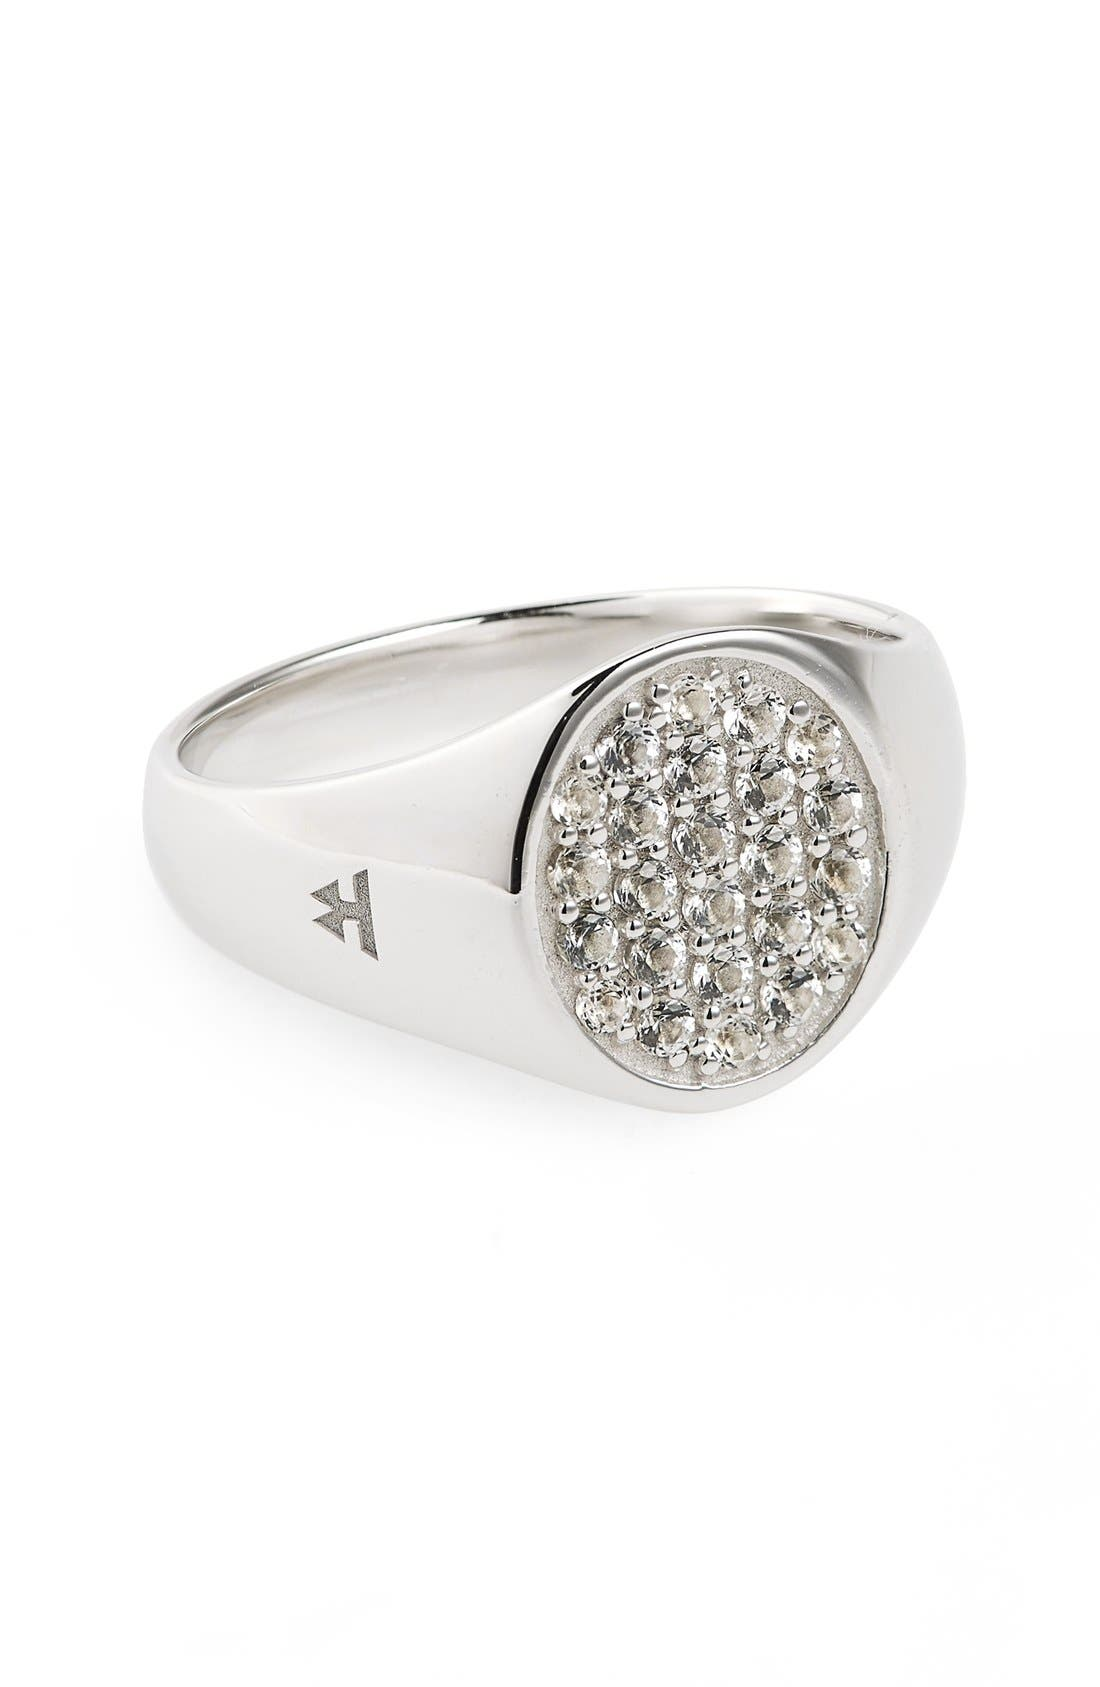 Tom Wood Mini Oval White Topaz Signet Ring